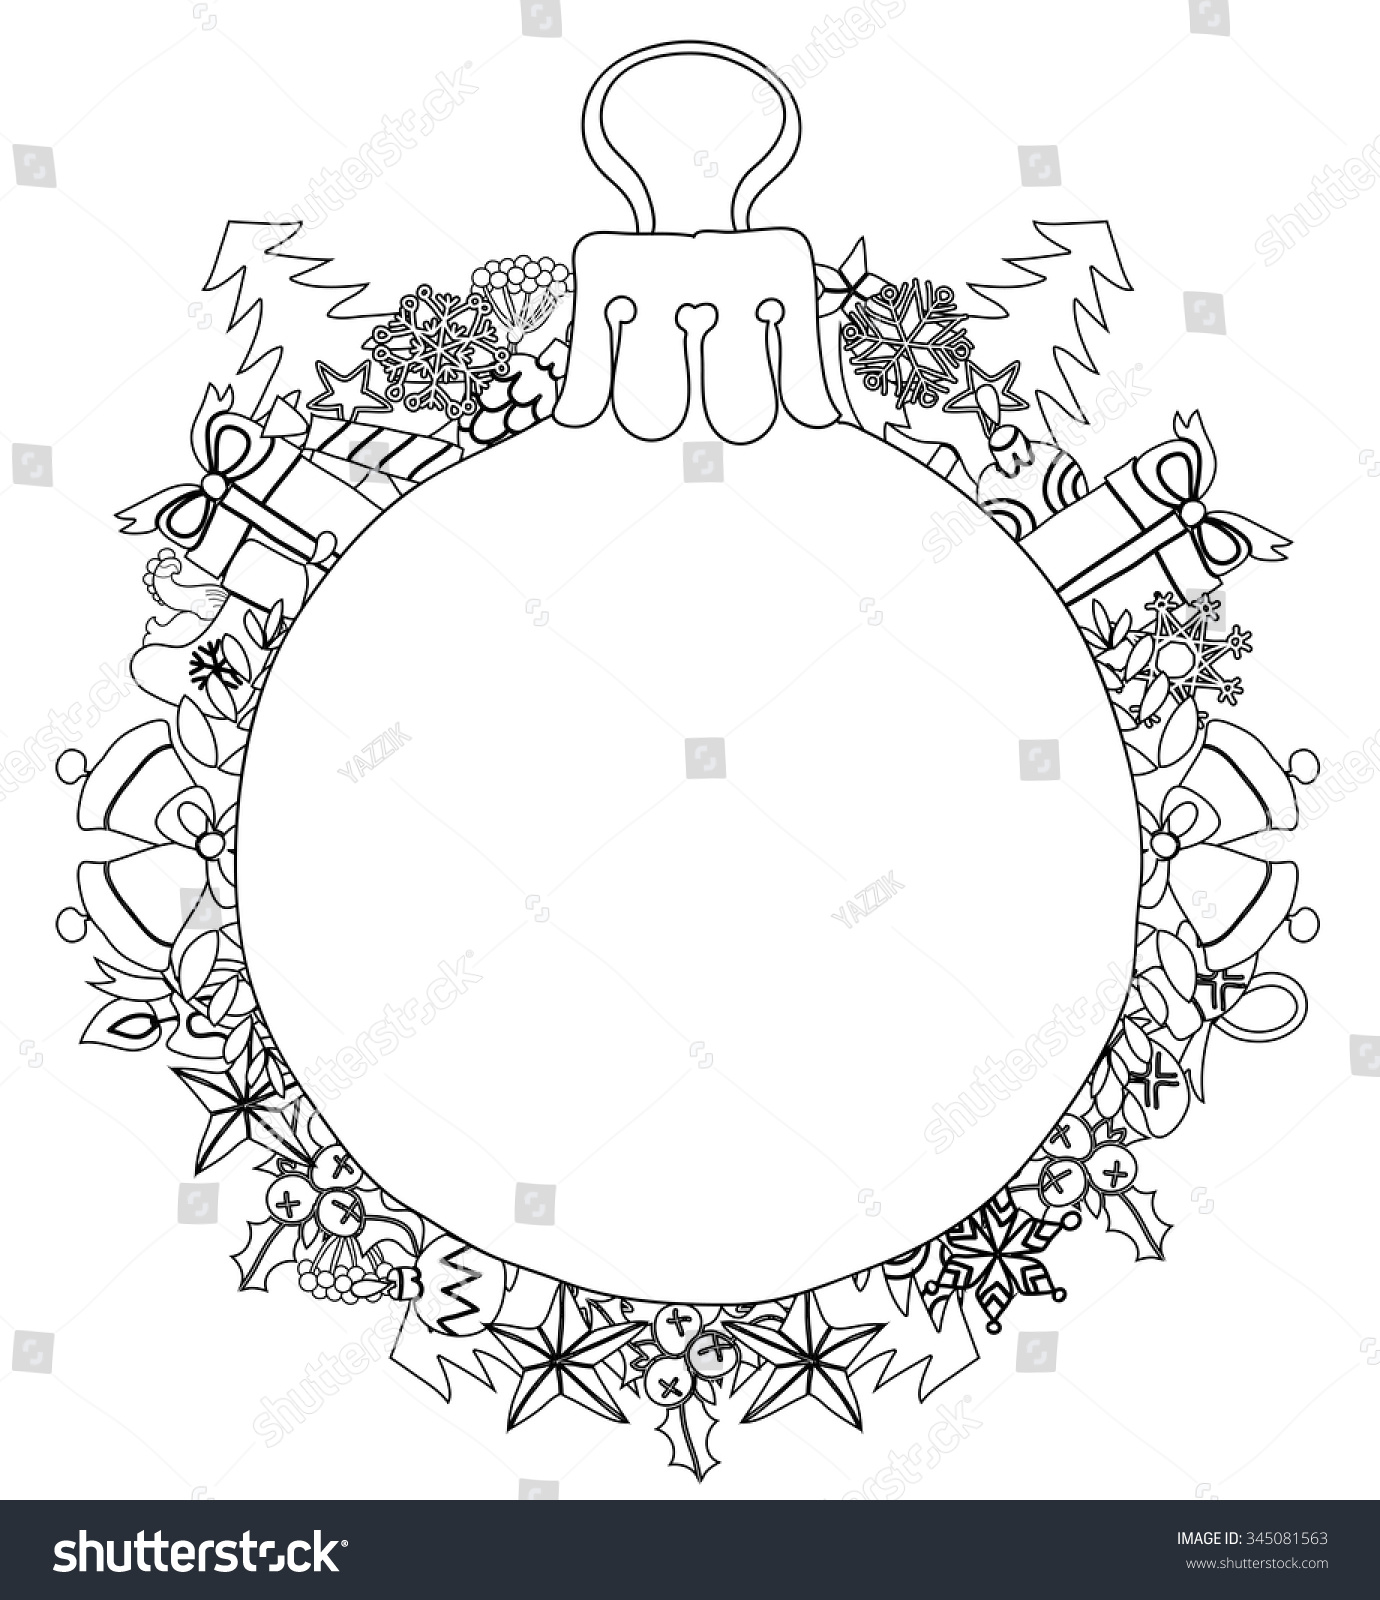 Hand drawn christmas glass ball fir tree doodle sketch